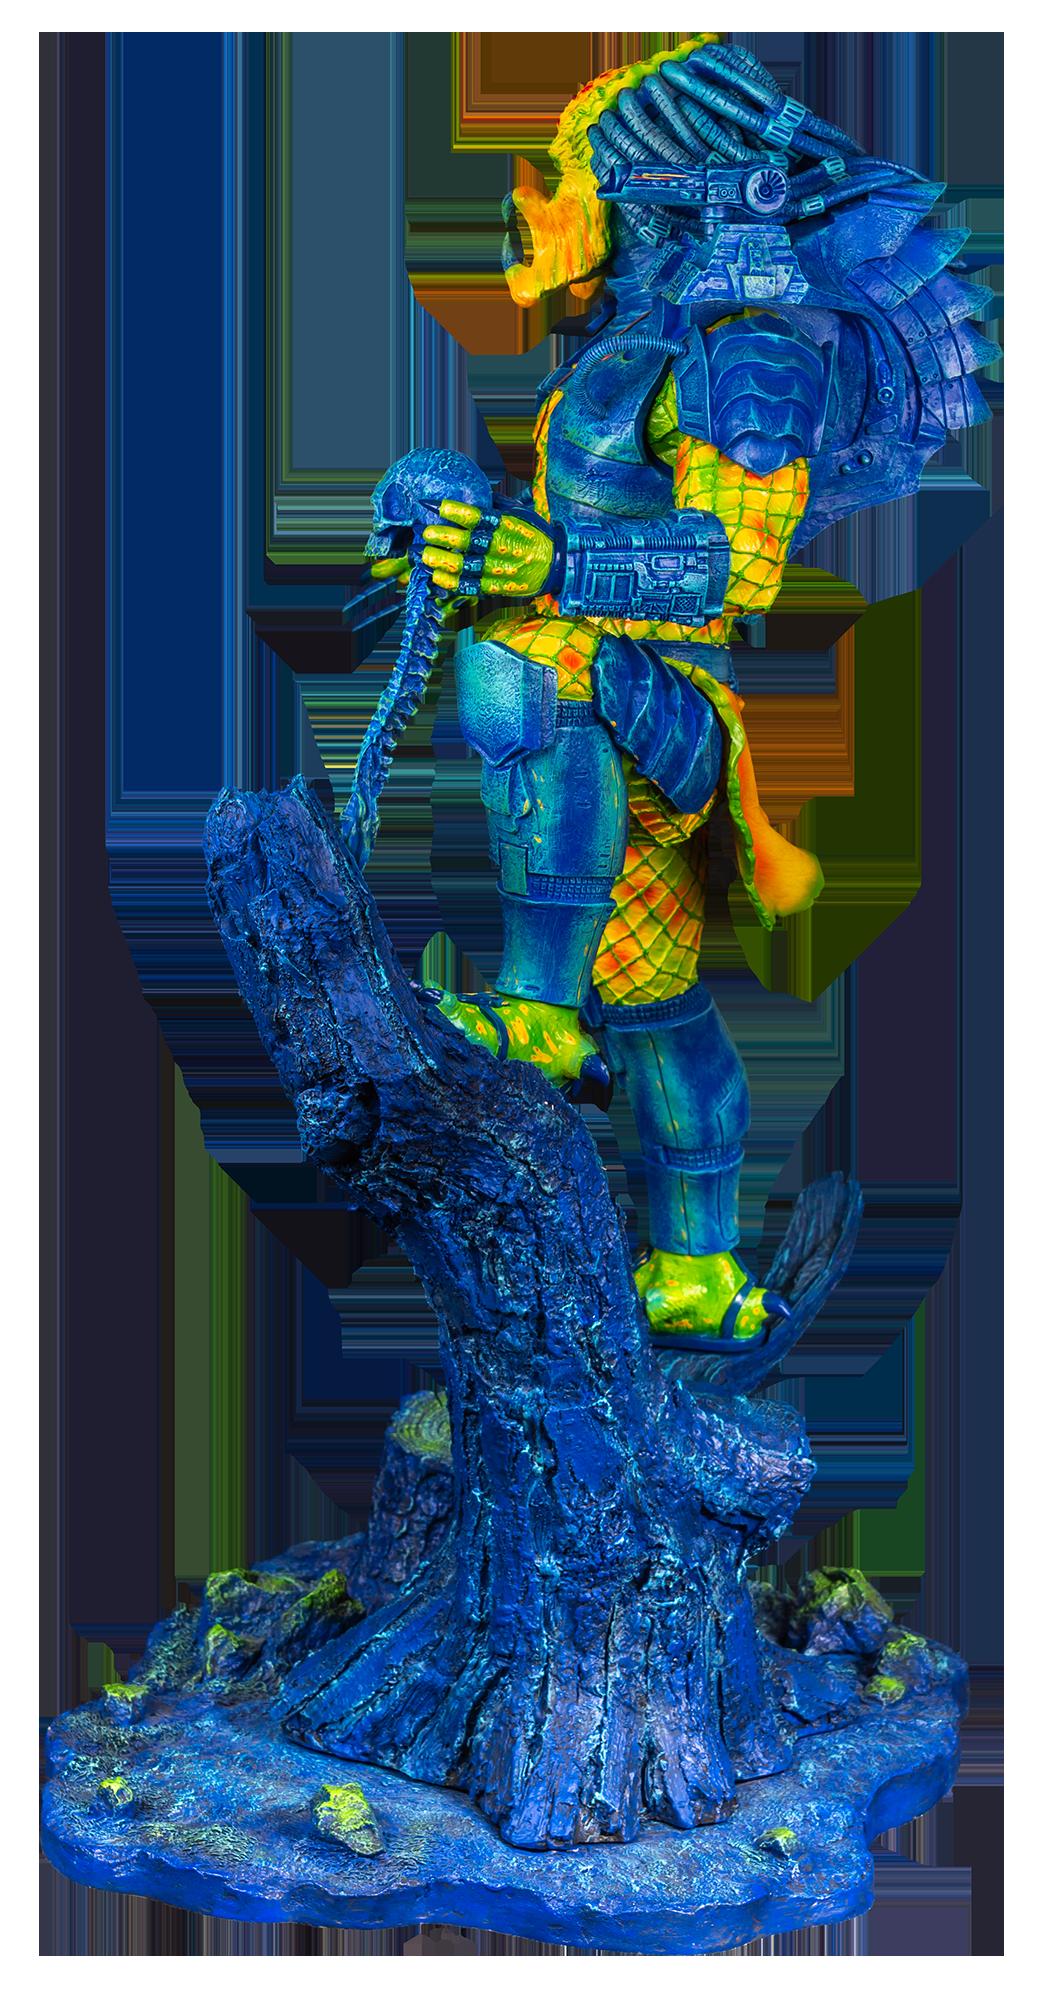 IKO1571-Thermal-Vision-Predator-Statue-POPCULTCHA-EXCLUSIVE-3.png